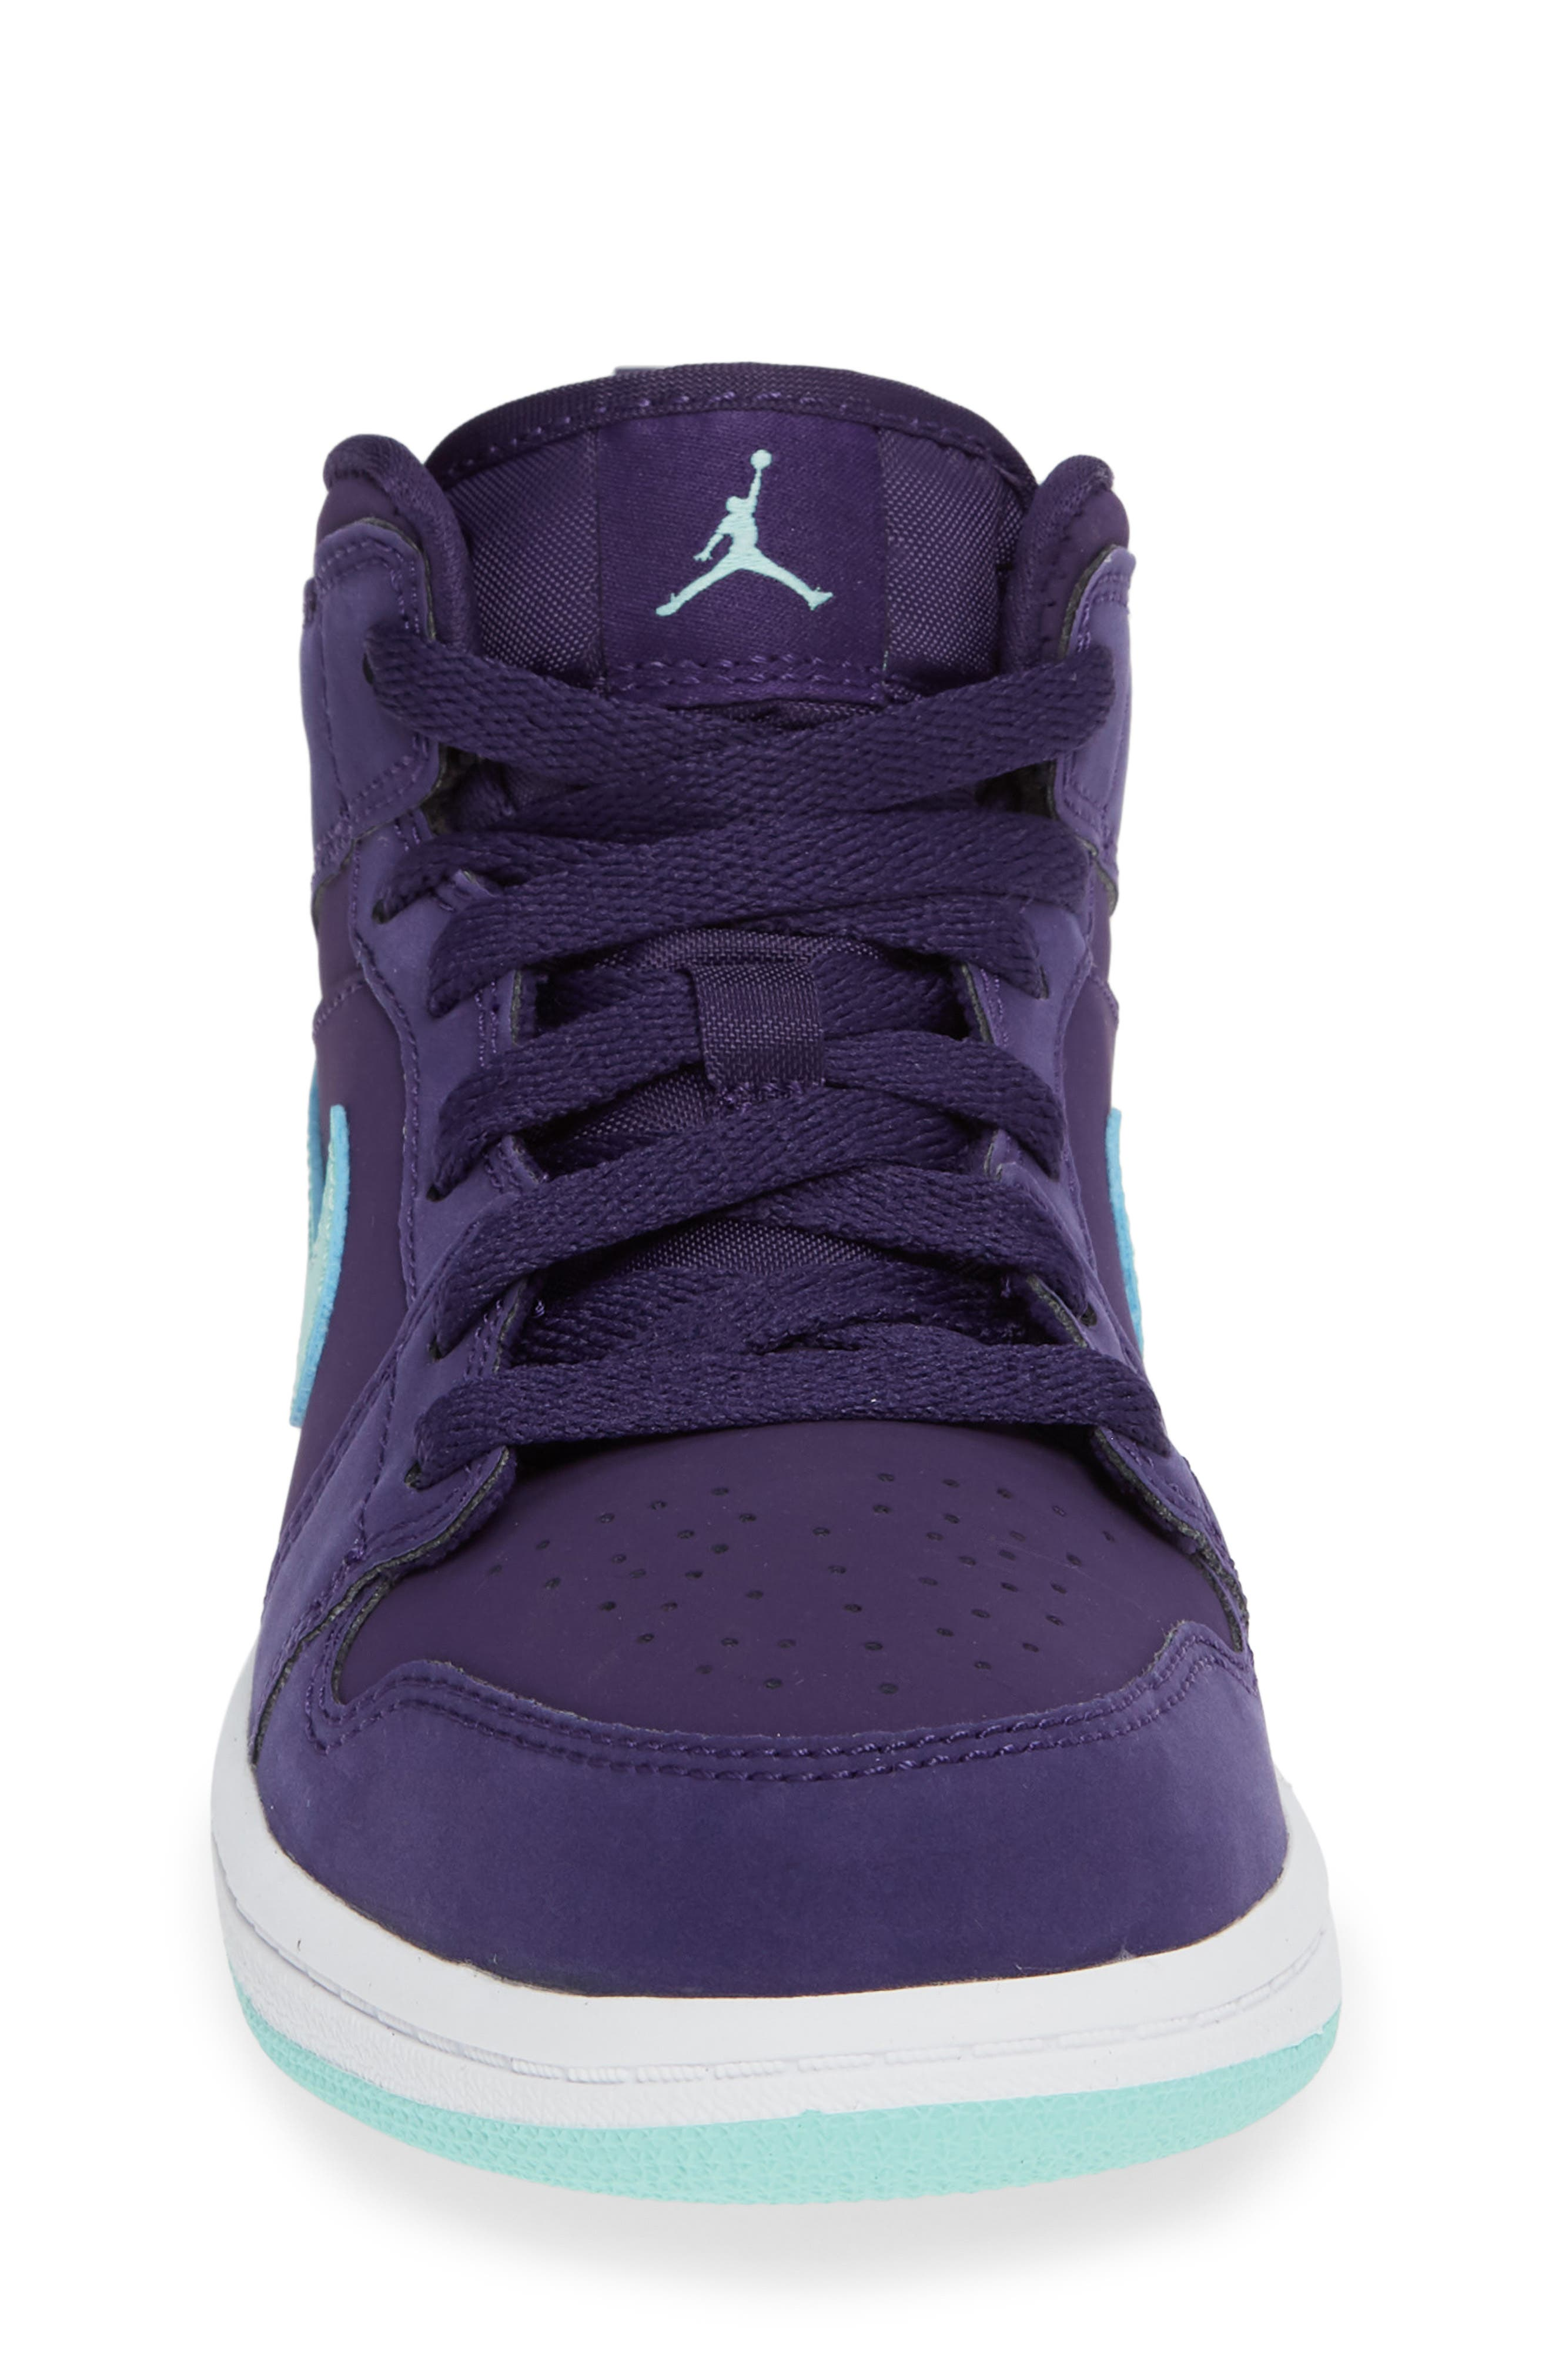 Nike 'Jordan 1 Mid' Basketball Shoe,                             Alternate thumbnail 4, color,                             INK/ EMERALD RISE/ WHITE